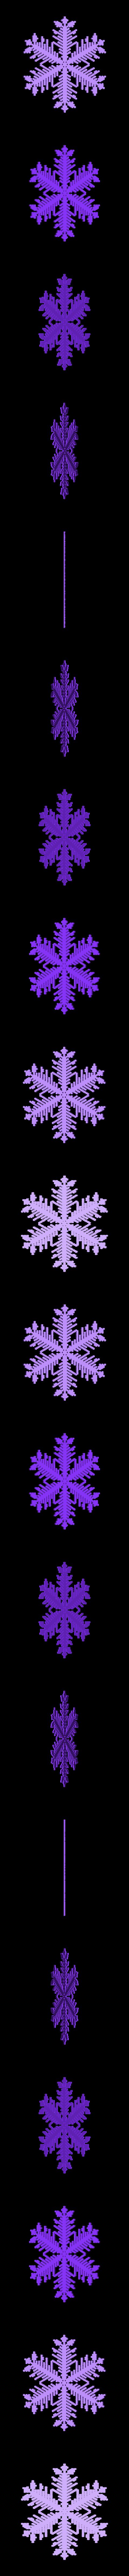 reiter40-1.6-0.7-0.002-80.stl Download free STL file Snowflake growth simulation in BlocksCAD • 3D printing design, arpruss